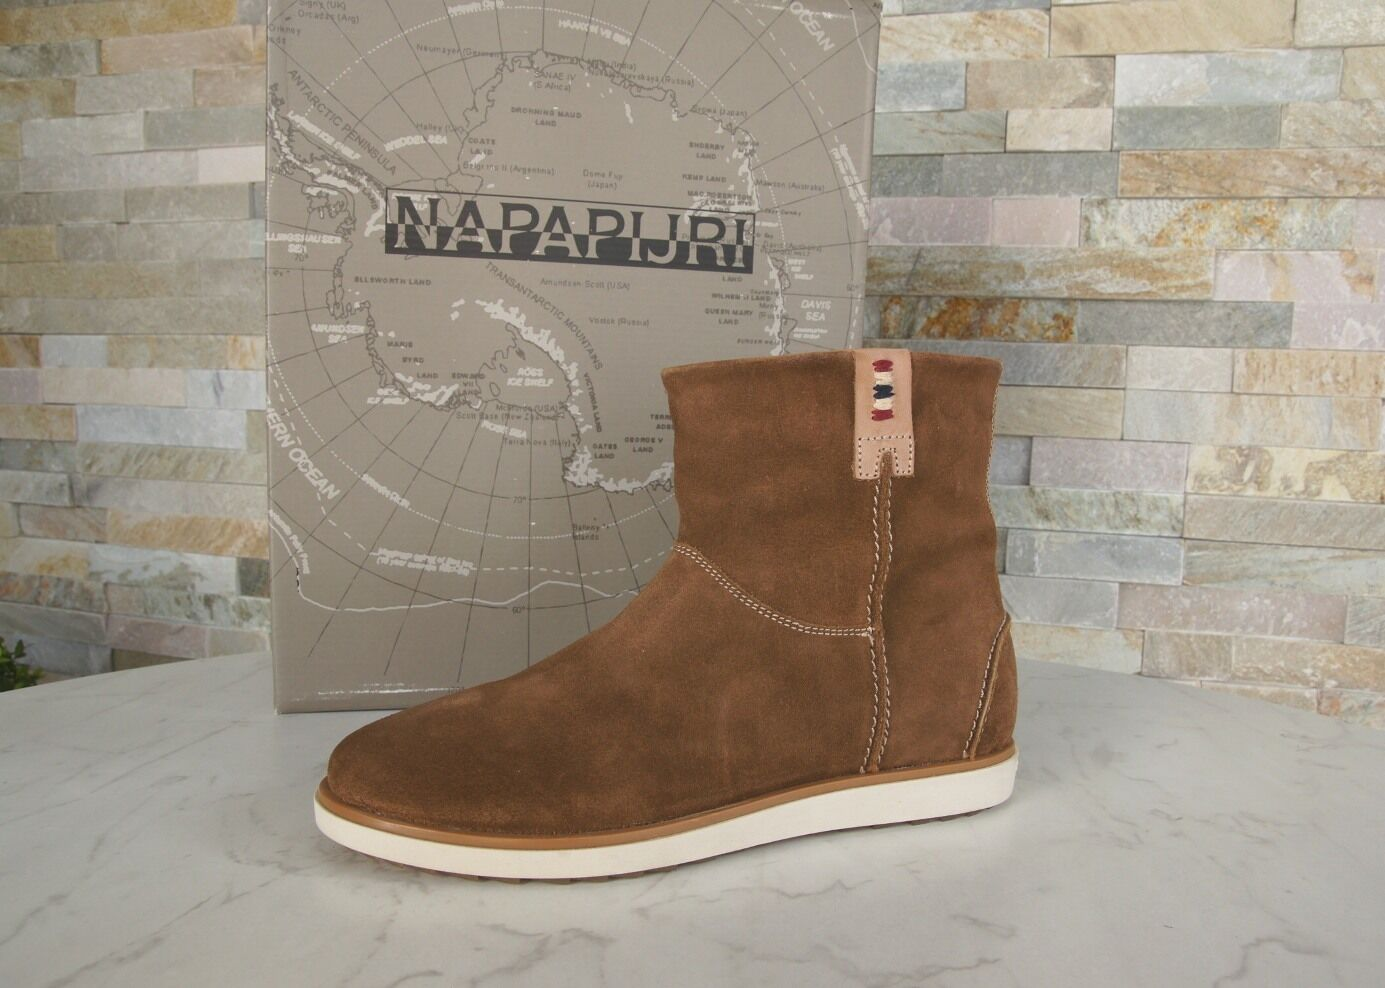 Napapijri Size 36 Ankle Boots Boots shoes Nora Cognac New Previously